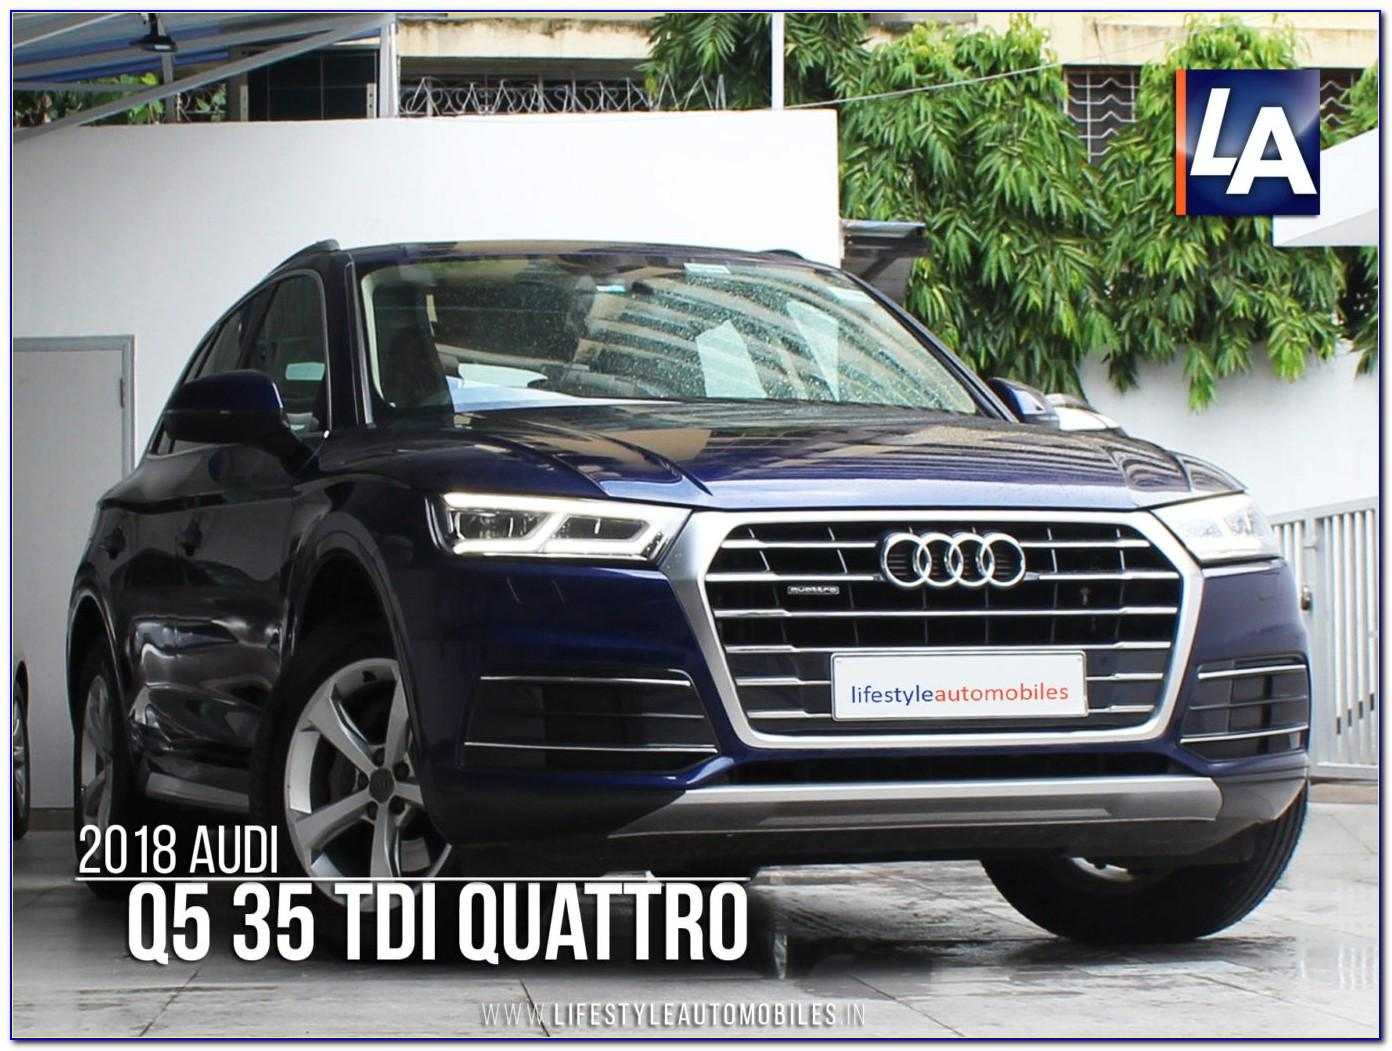 2018 Audi A4 Brochure Pdf